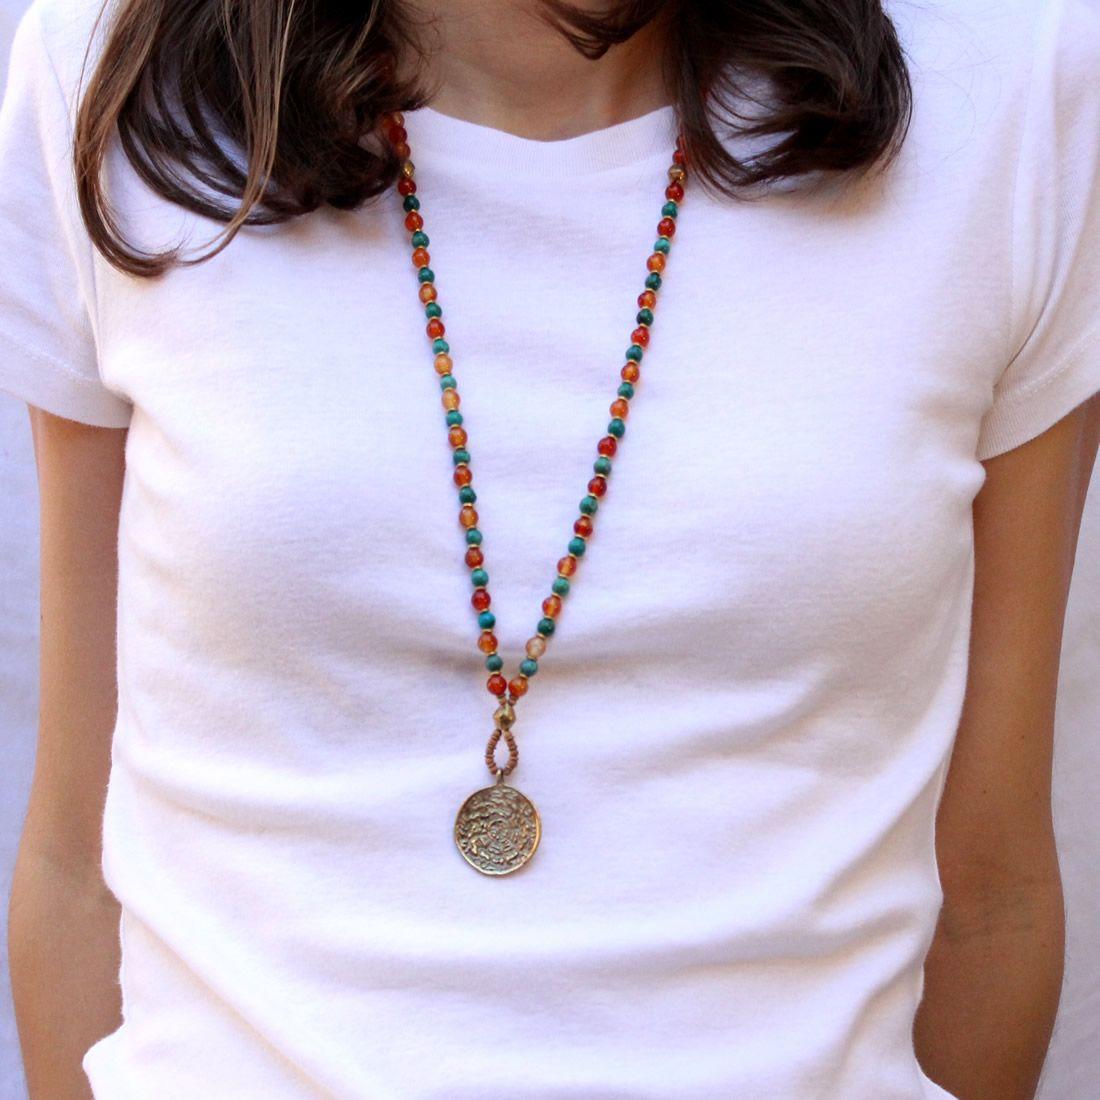 Carnelian and turquoise 108 bead mala necklace with Tibetan calendar pendant. #orange #necklace #malanecklace #loveprayjewelry